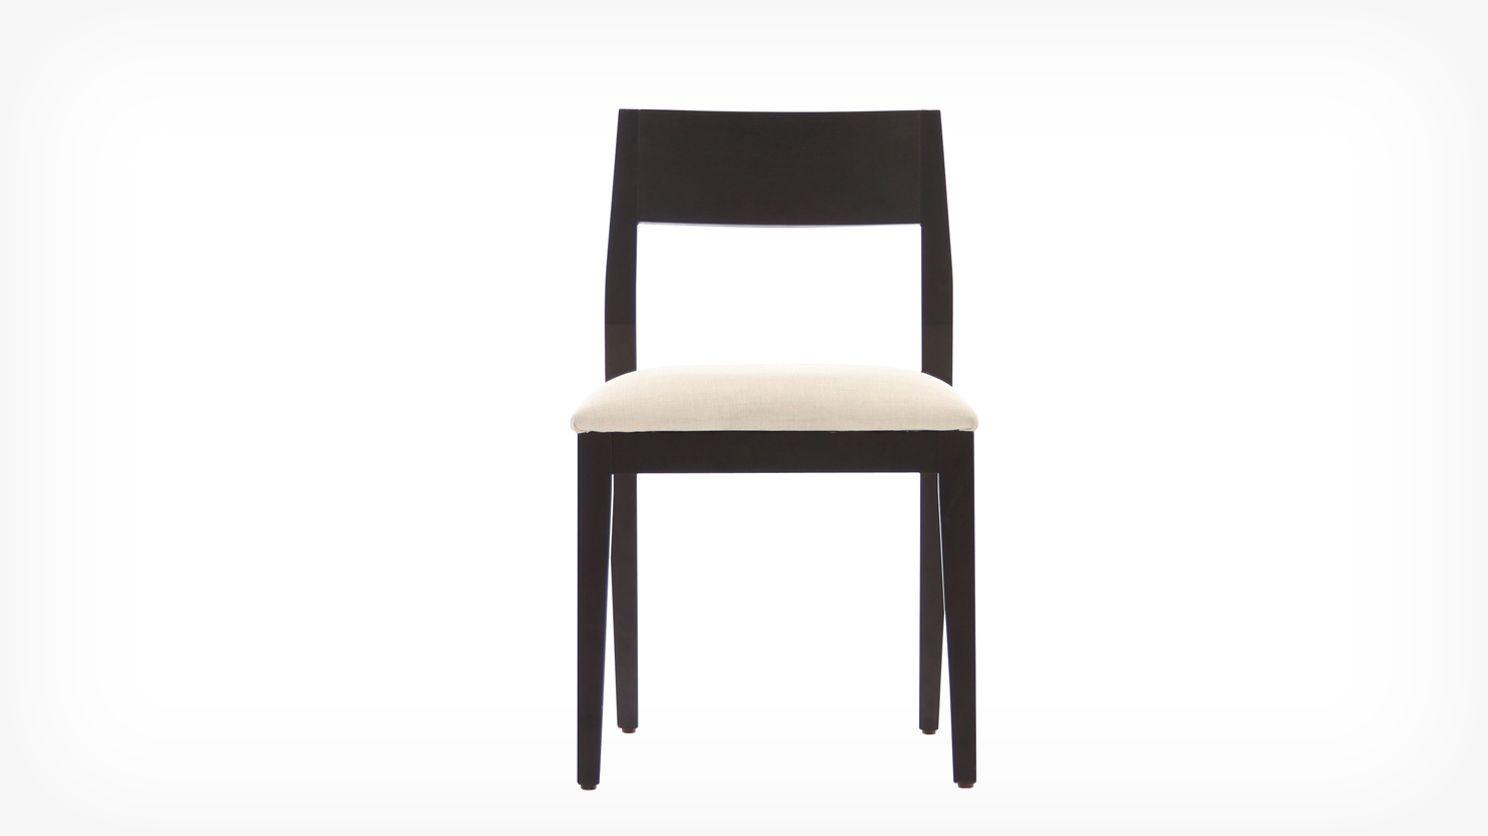 Awe Inspiring Open Back Dining Chair Eq3 Modern Furniture Dining Room Dailytribune Chair Design For Home Dailytribuneorg